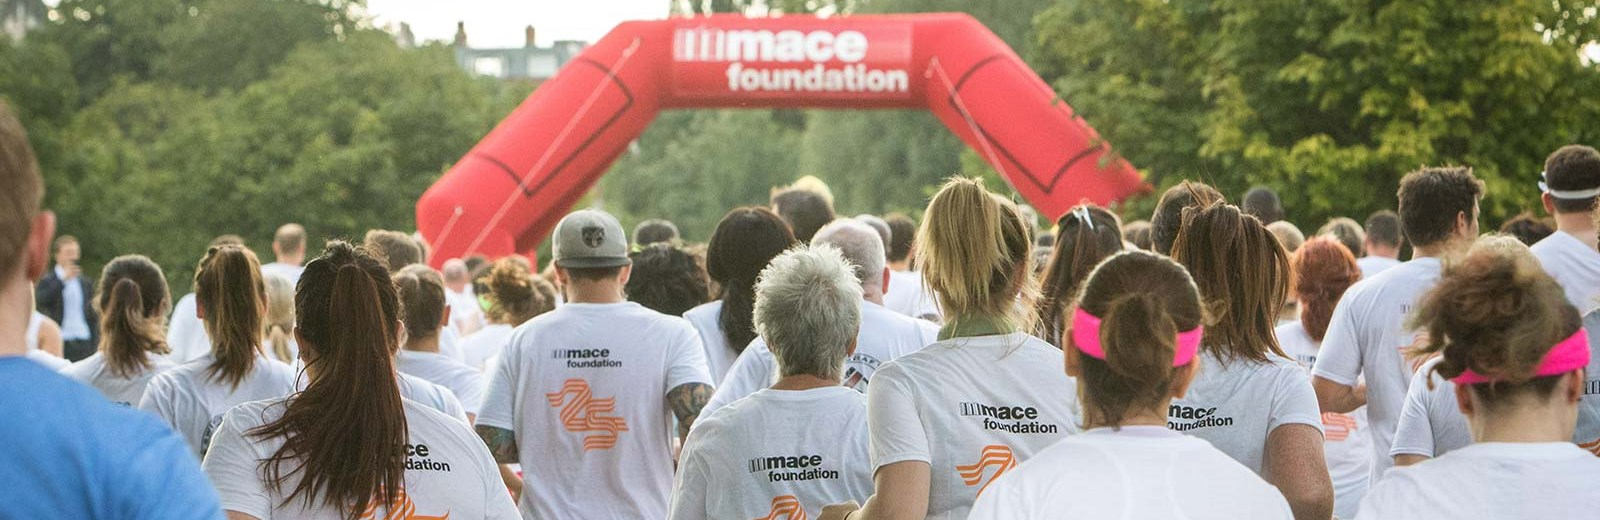 Mace Foundation Marathon Start - Mace Group